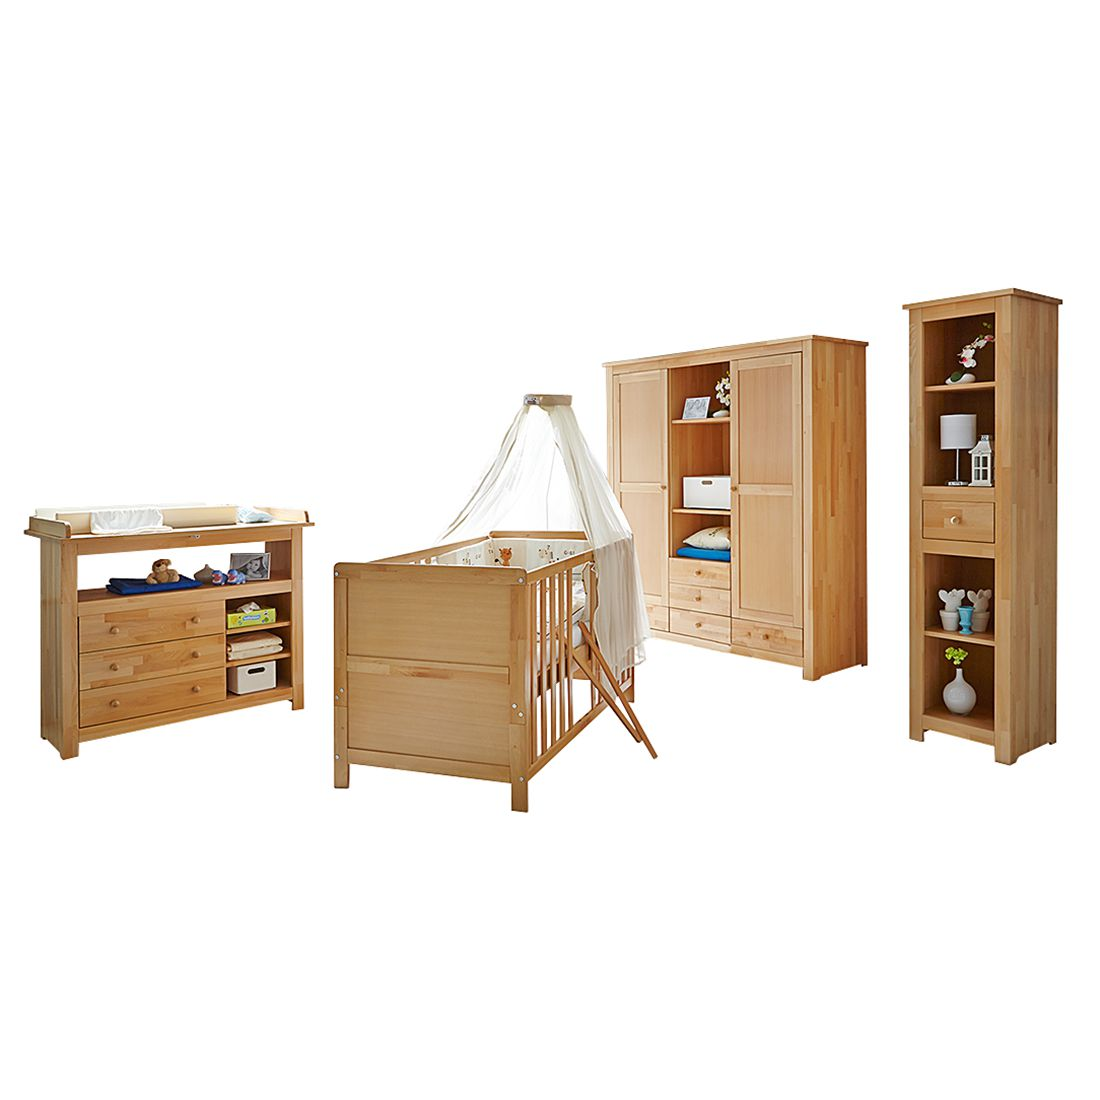 Babyzimmer Provence II (4-teilig) - Buche massiv, Ticaa